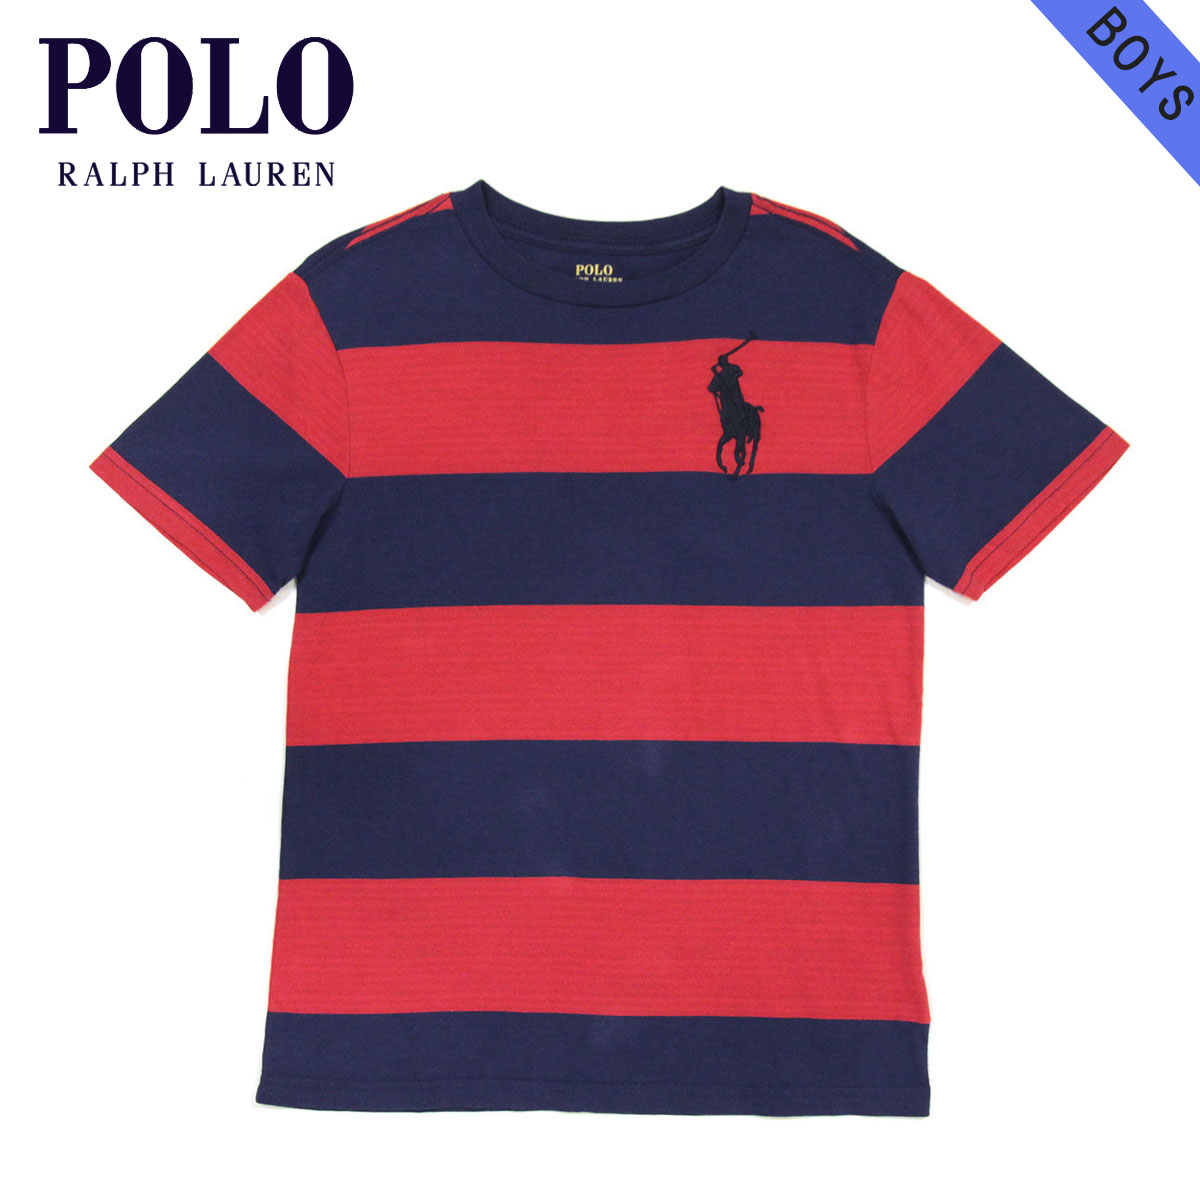 f4e5d93c Polo Ralph Lauren kids POLO RALPH LAUREN CHILDREN regular article children's  clothes Boys big pony short ...